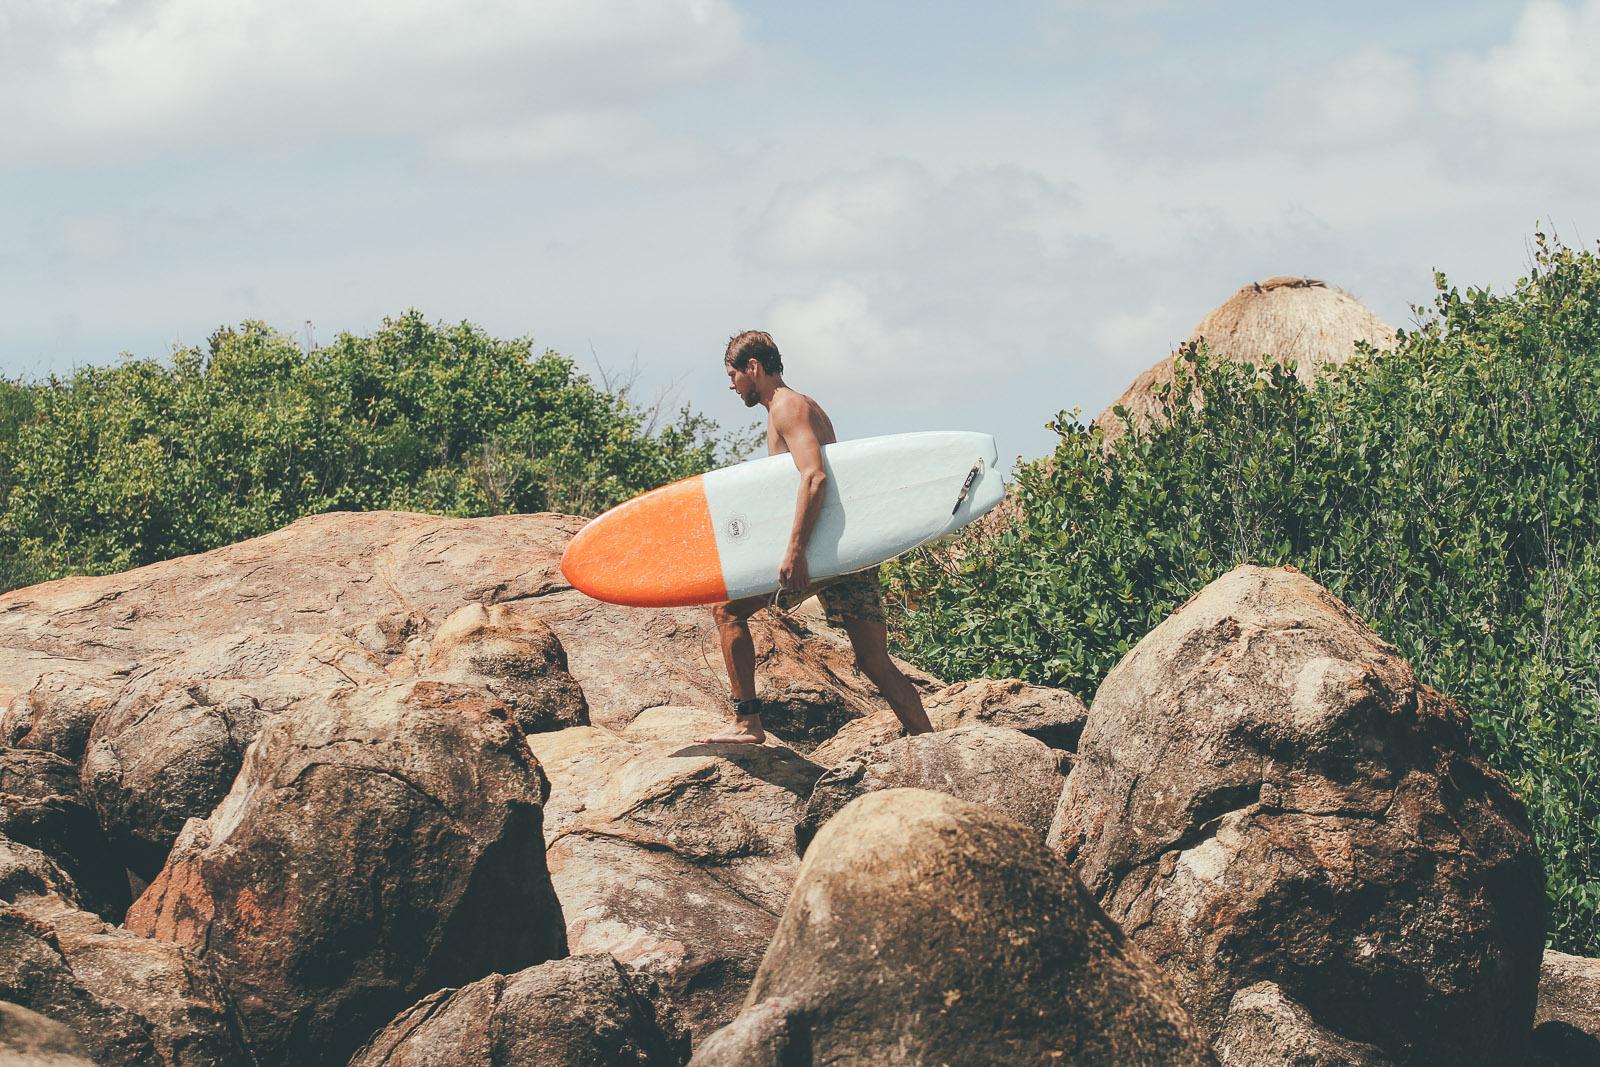 Sunshinestories-surf-travel-blog-IMG_8201